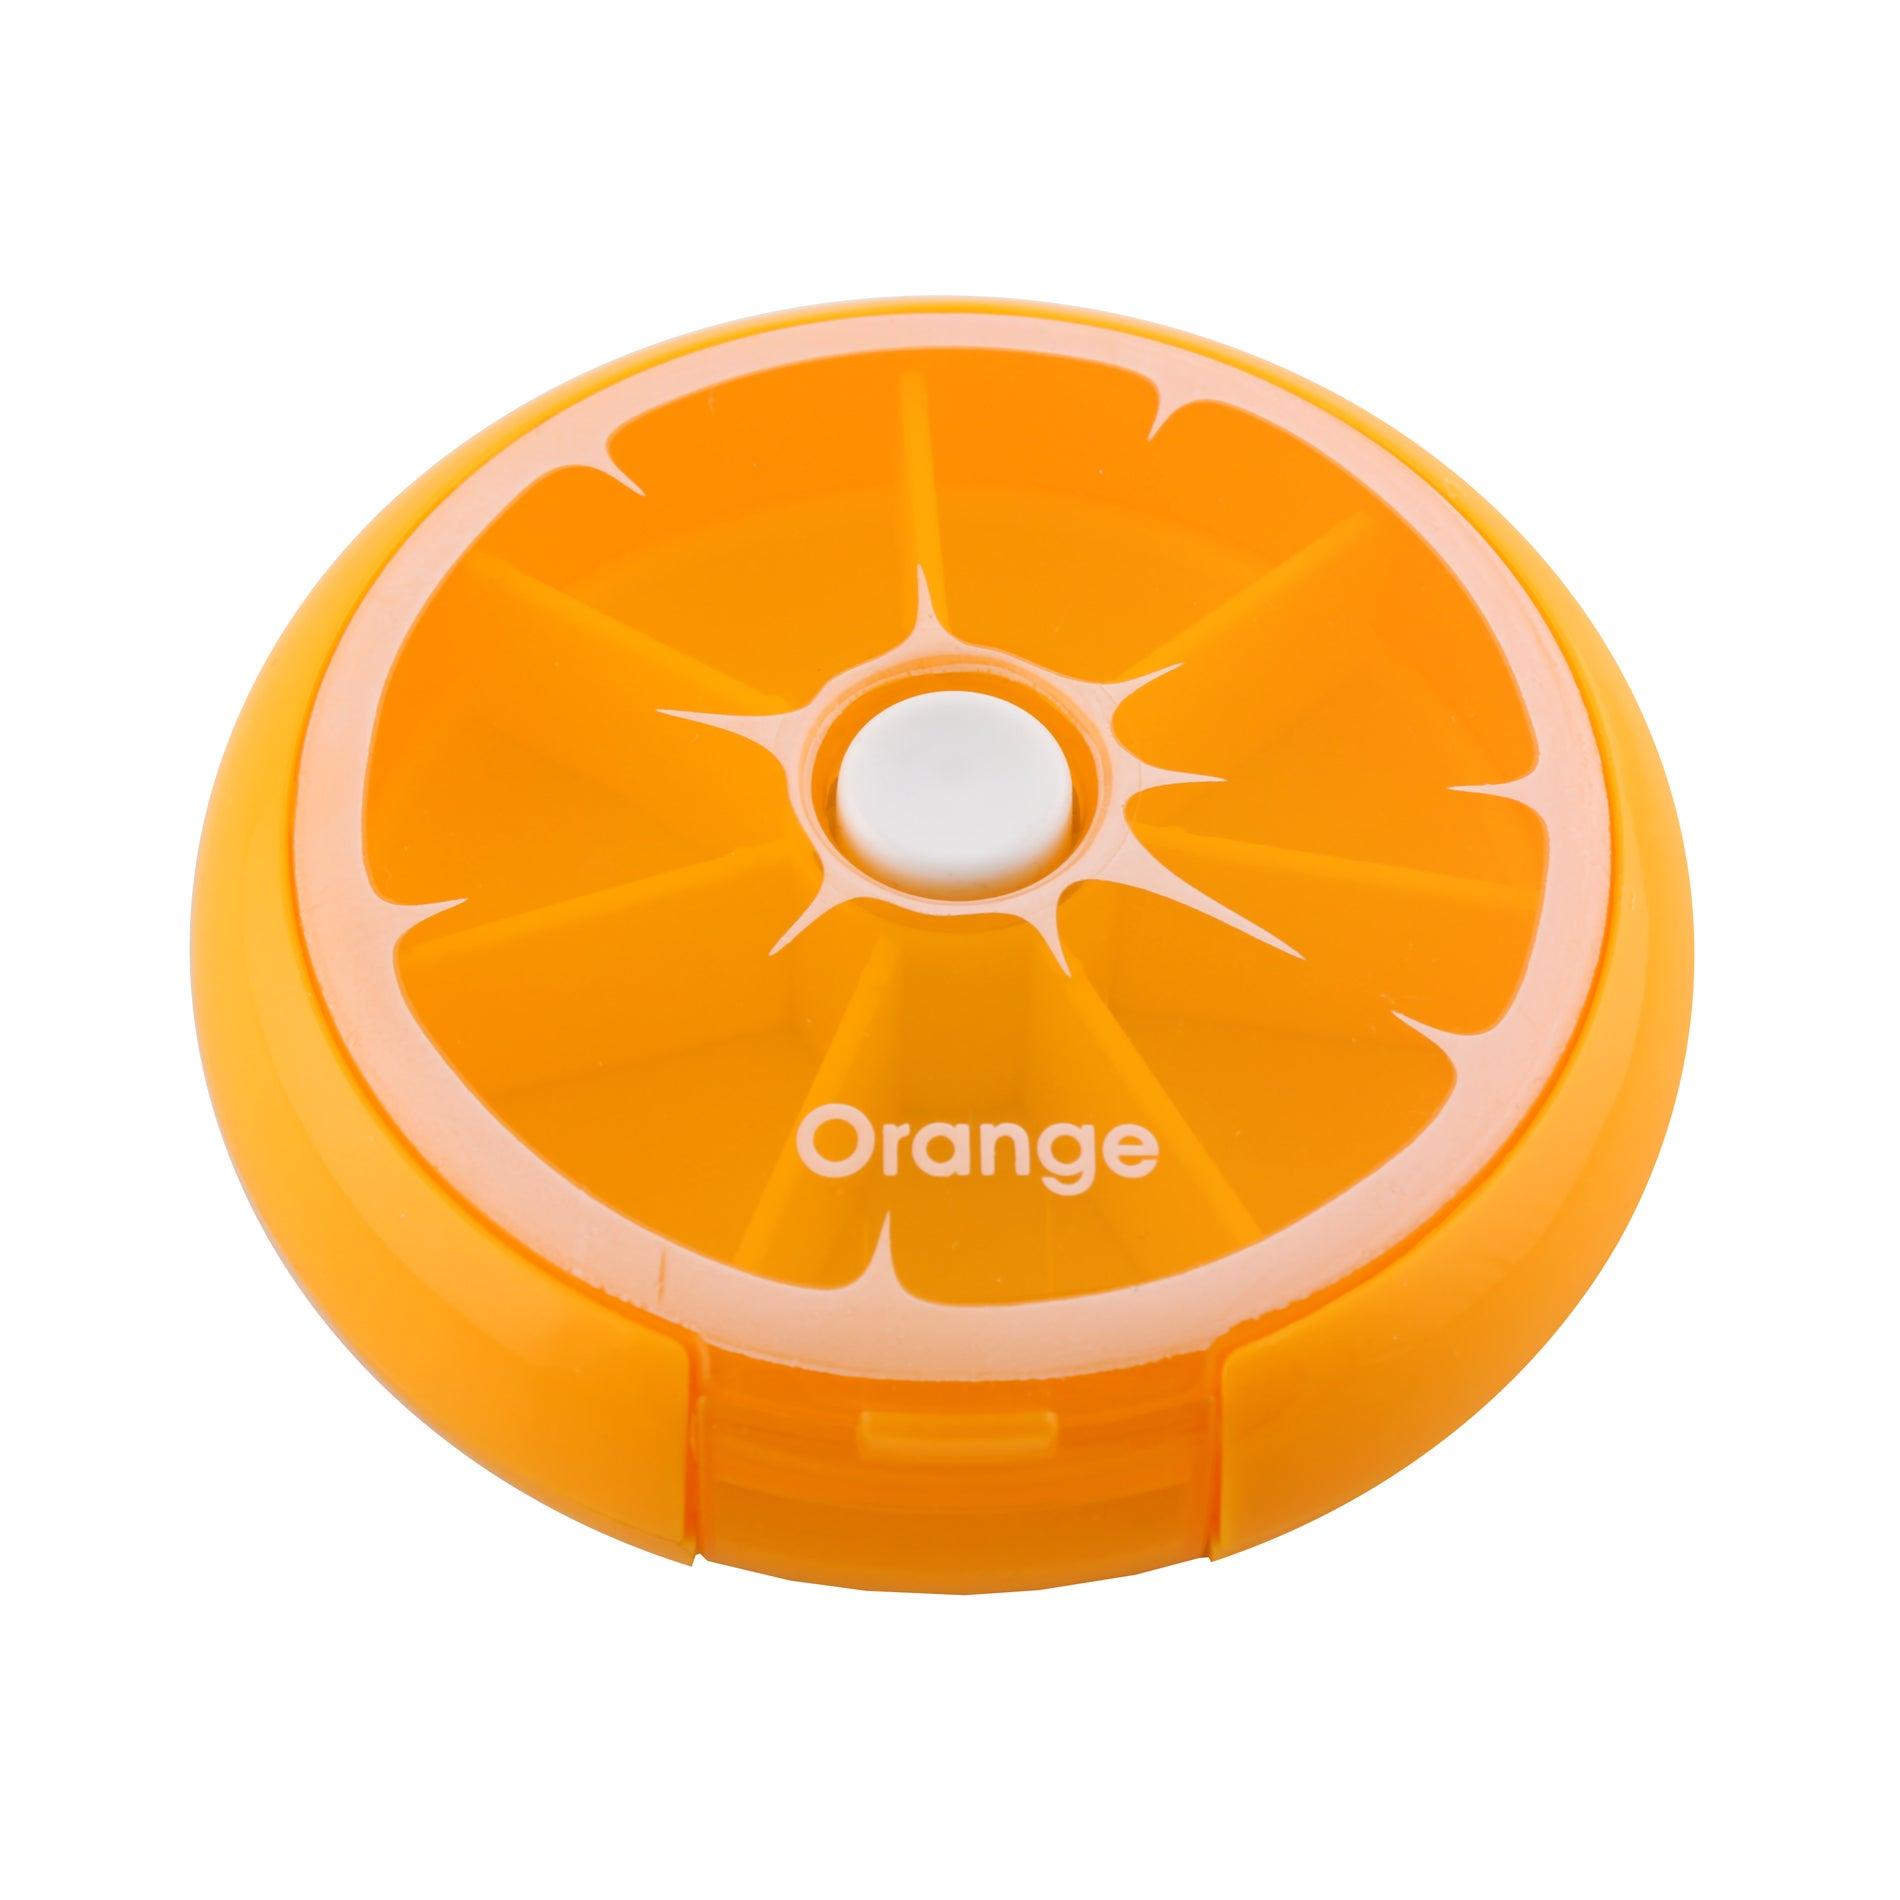 DAILY 7 DAY ROUND PILL BOX STORAGE DISPENSER ORGANISERS TABLETS CASE Orange